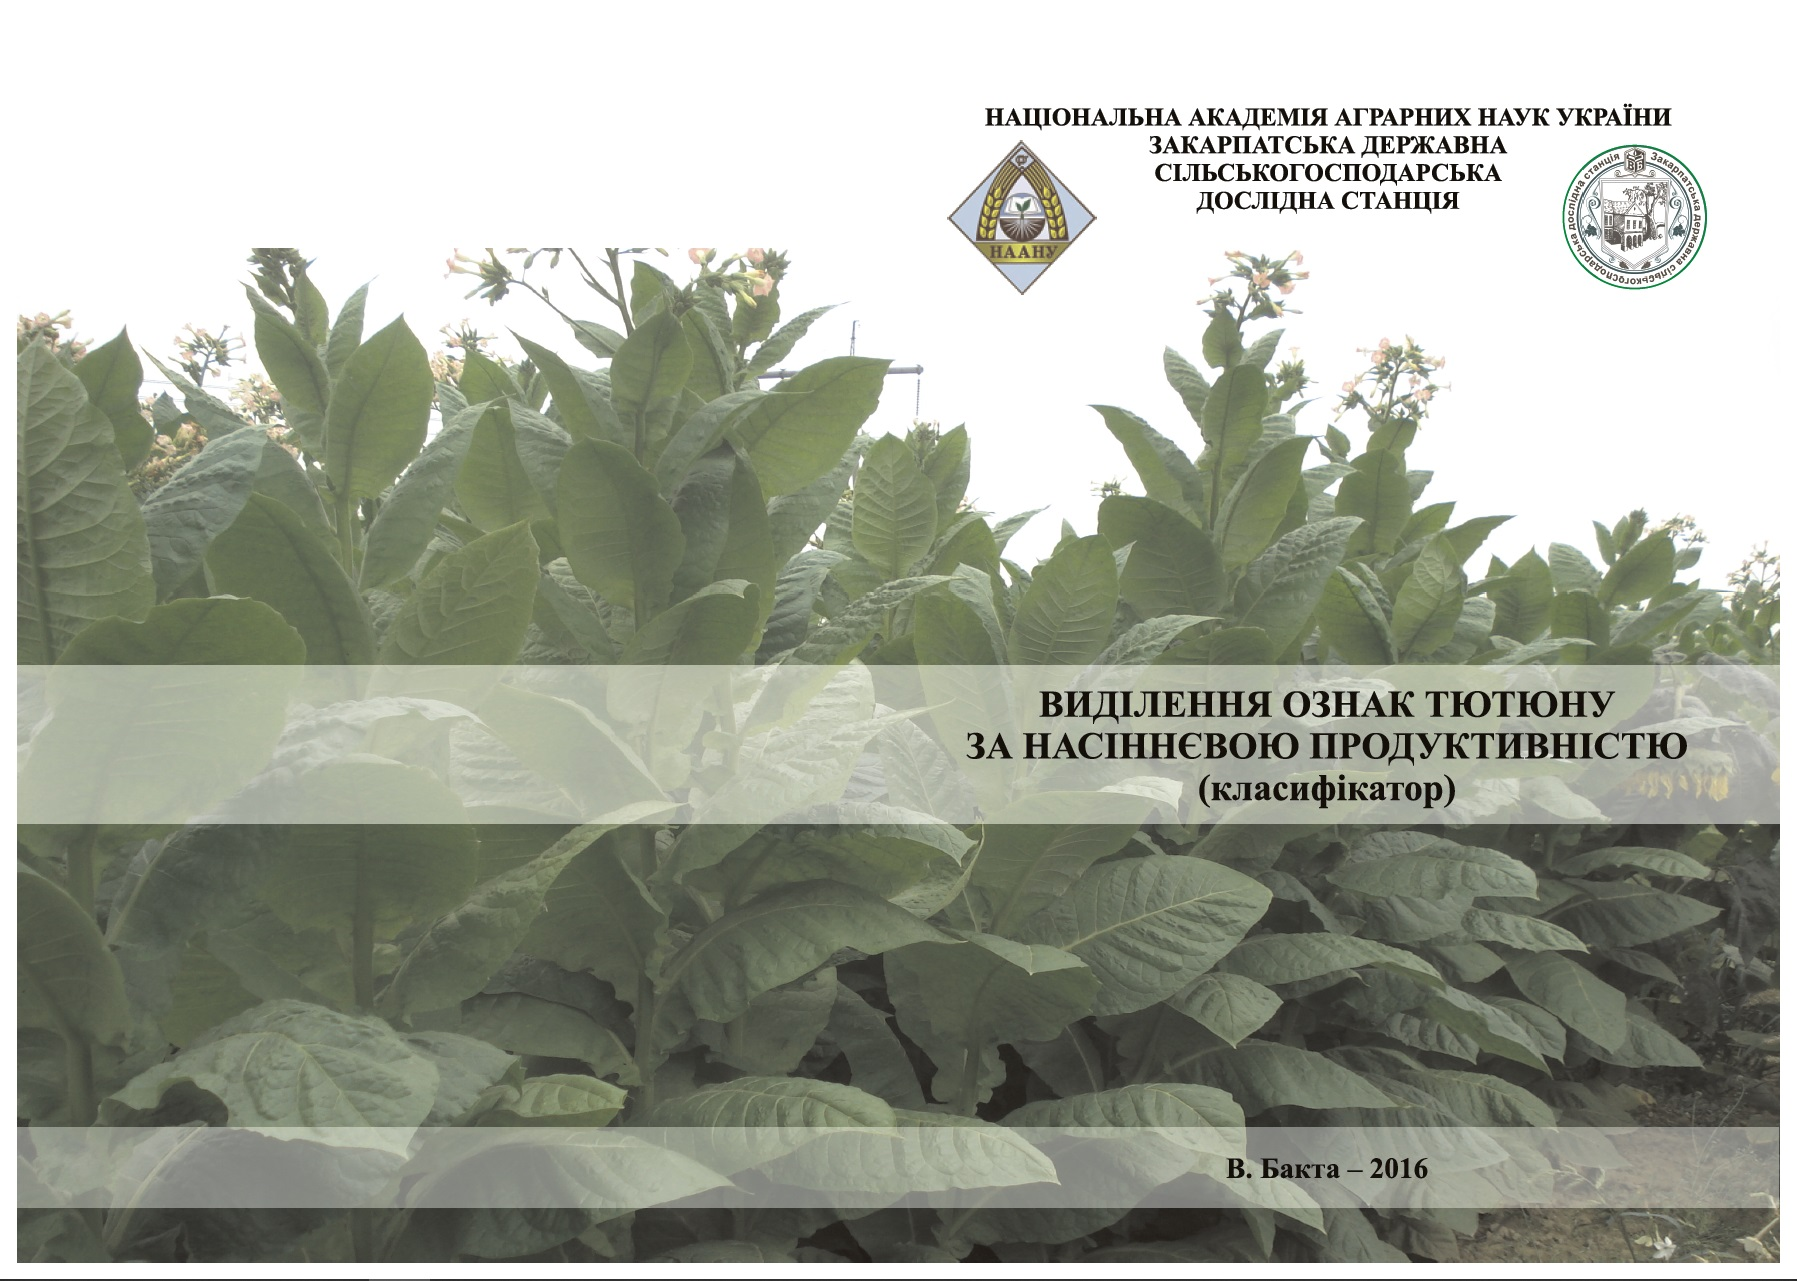 https://insbakta.org.ua/wp-content/uploads/2020/05/tyutyun.jpg